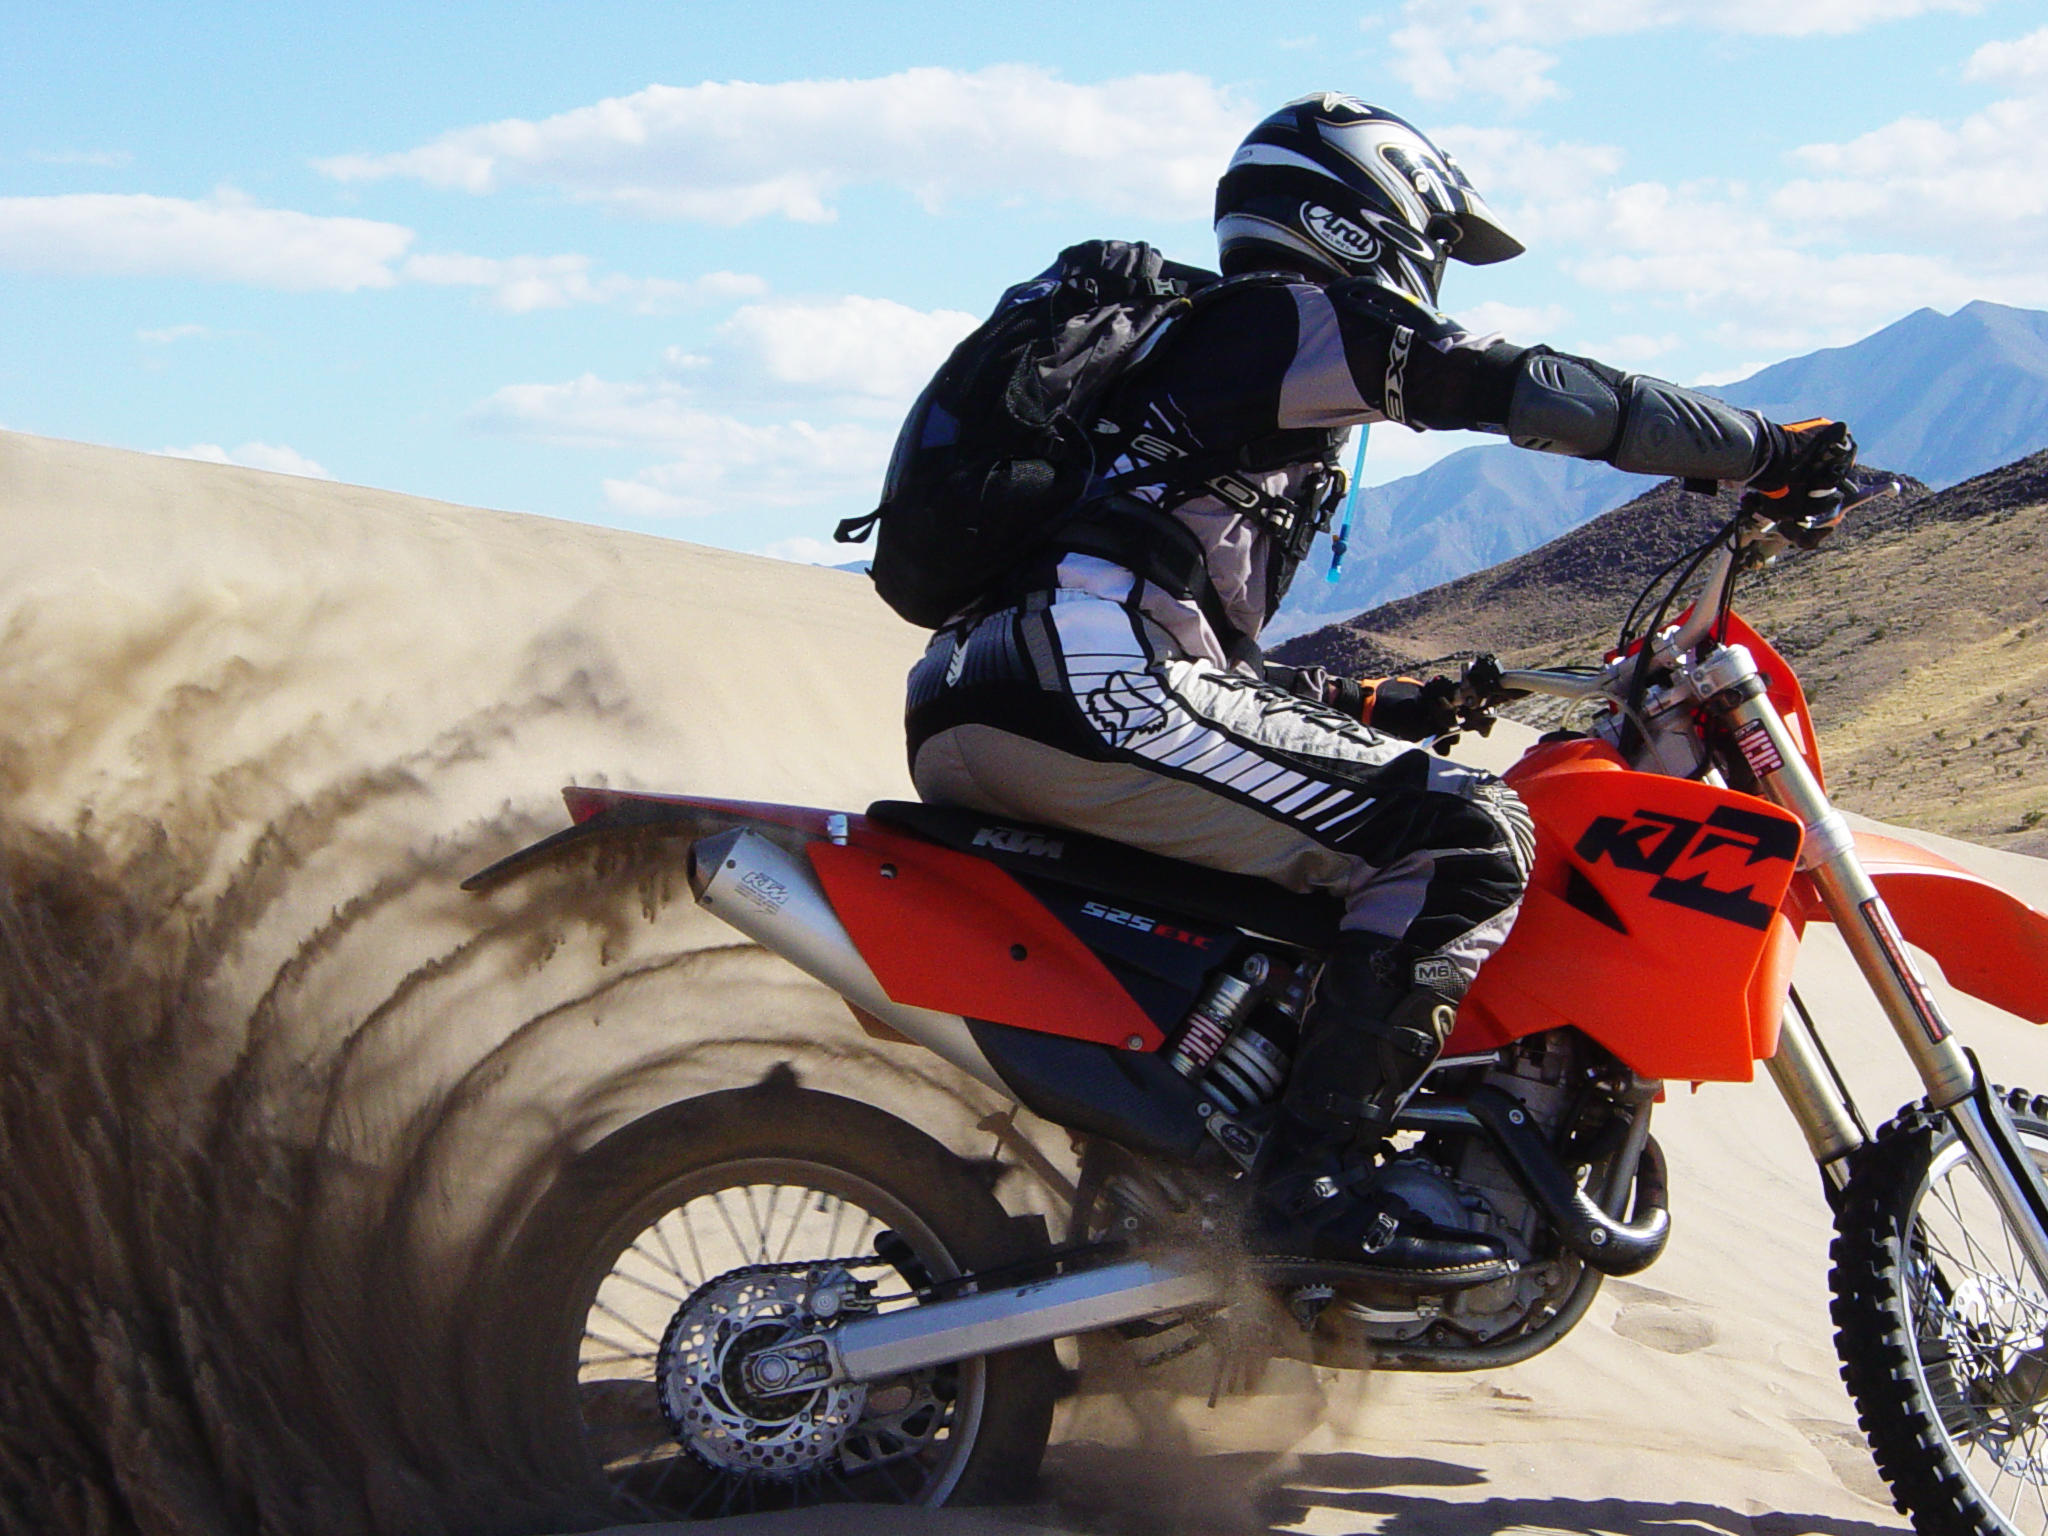 Better Street Riding Begins With Dirt